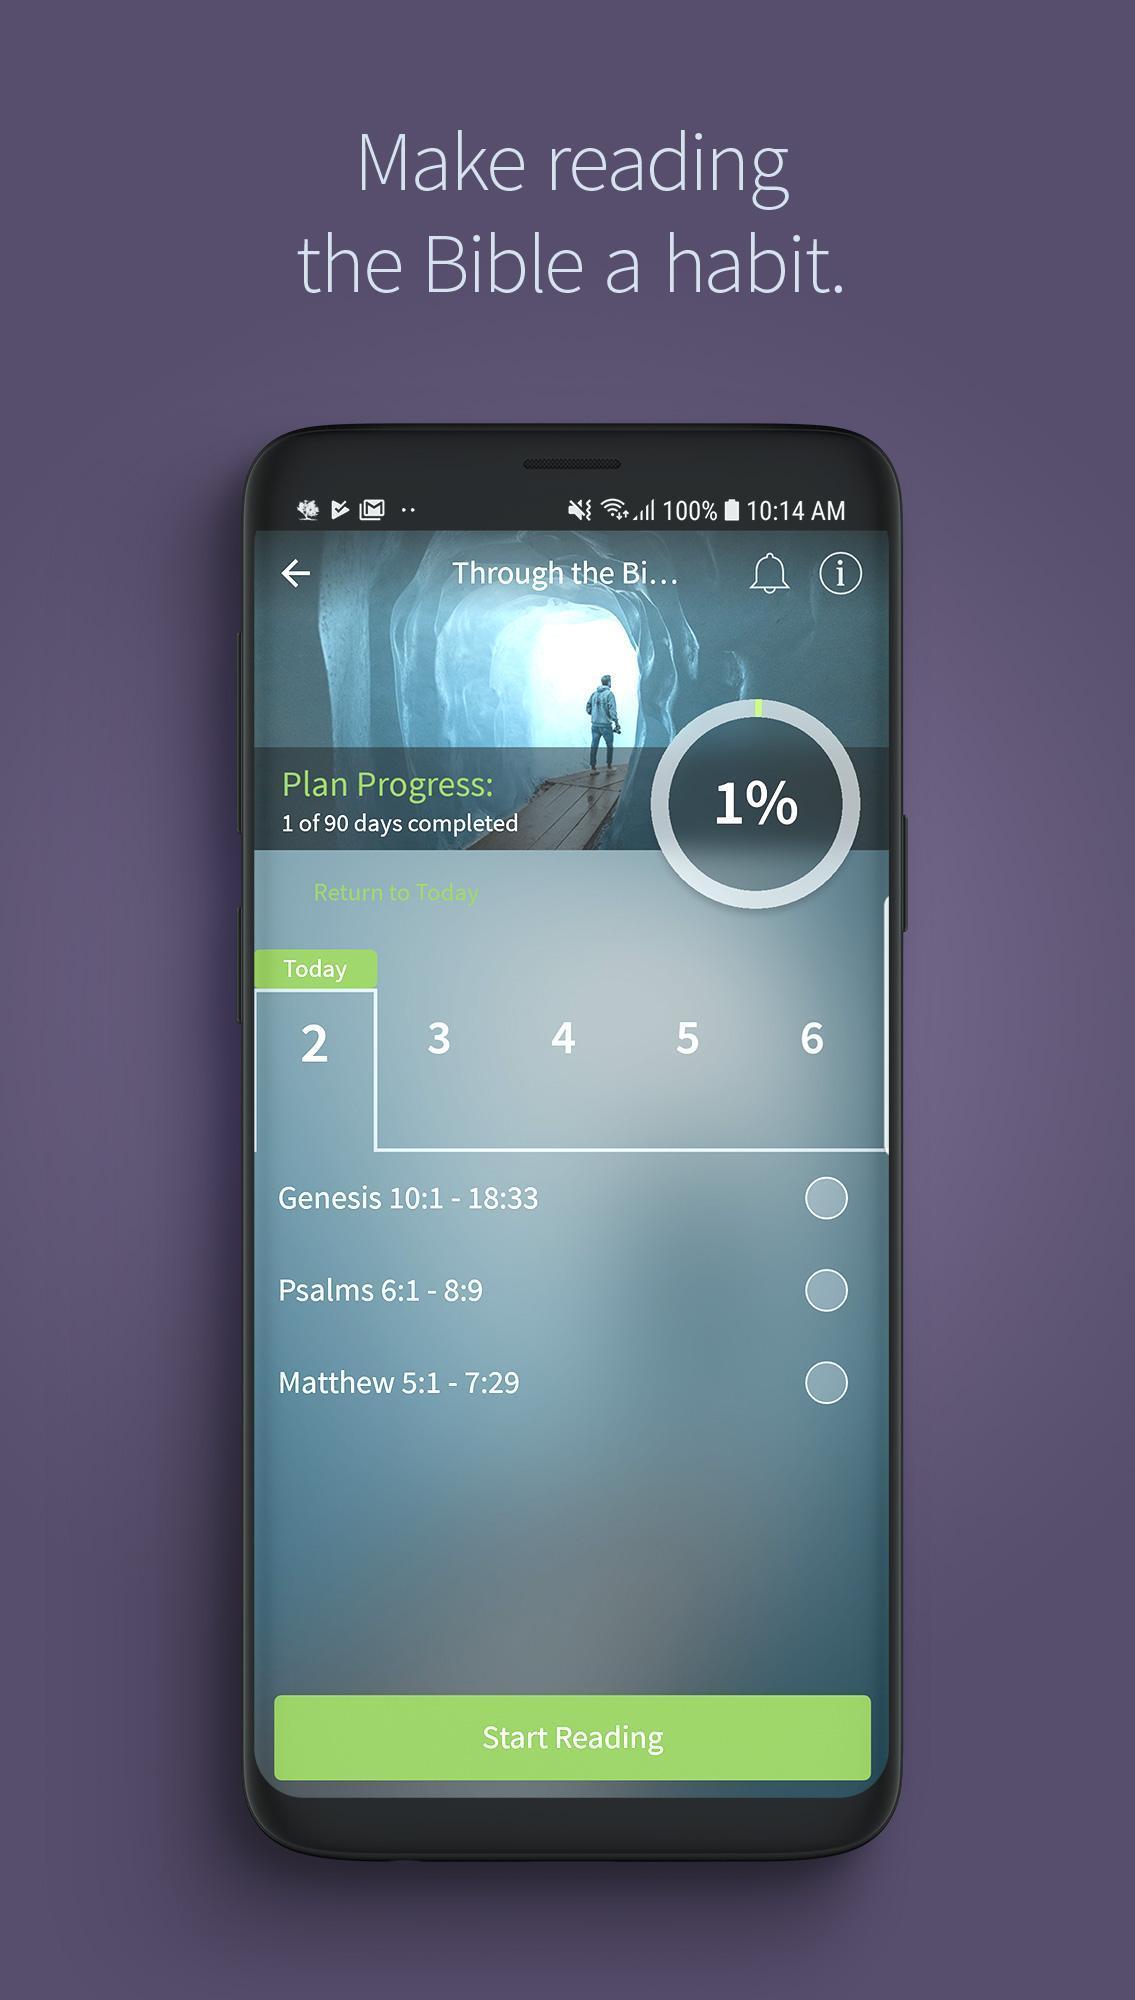 Bible App by Olive Tree 7.5.4.0.5664 Screenshot 4